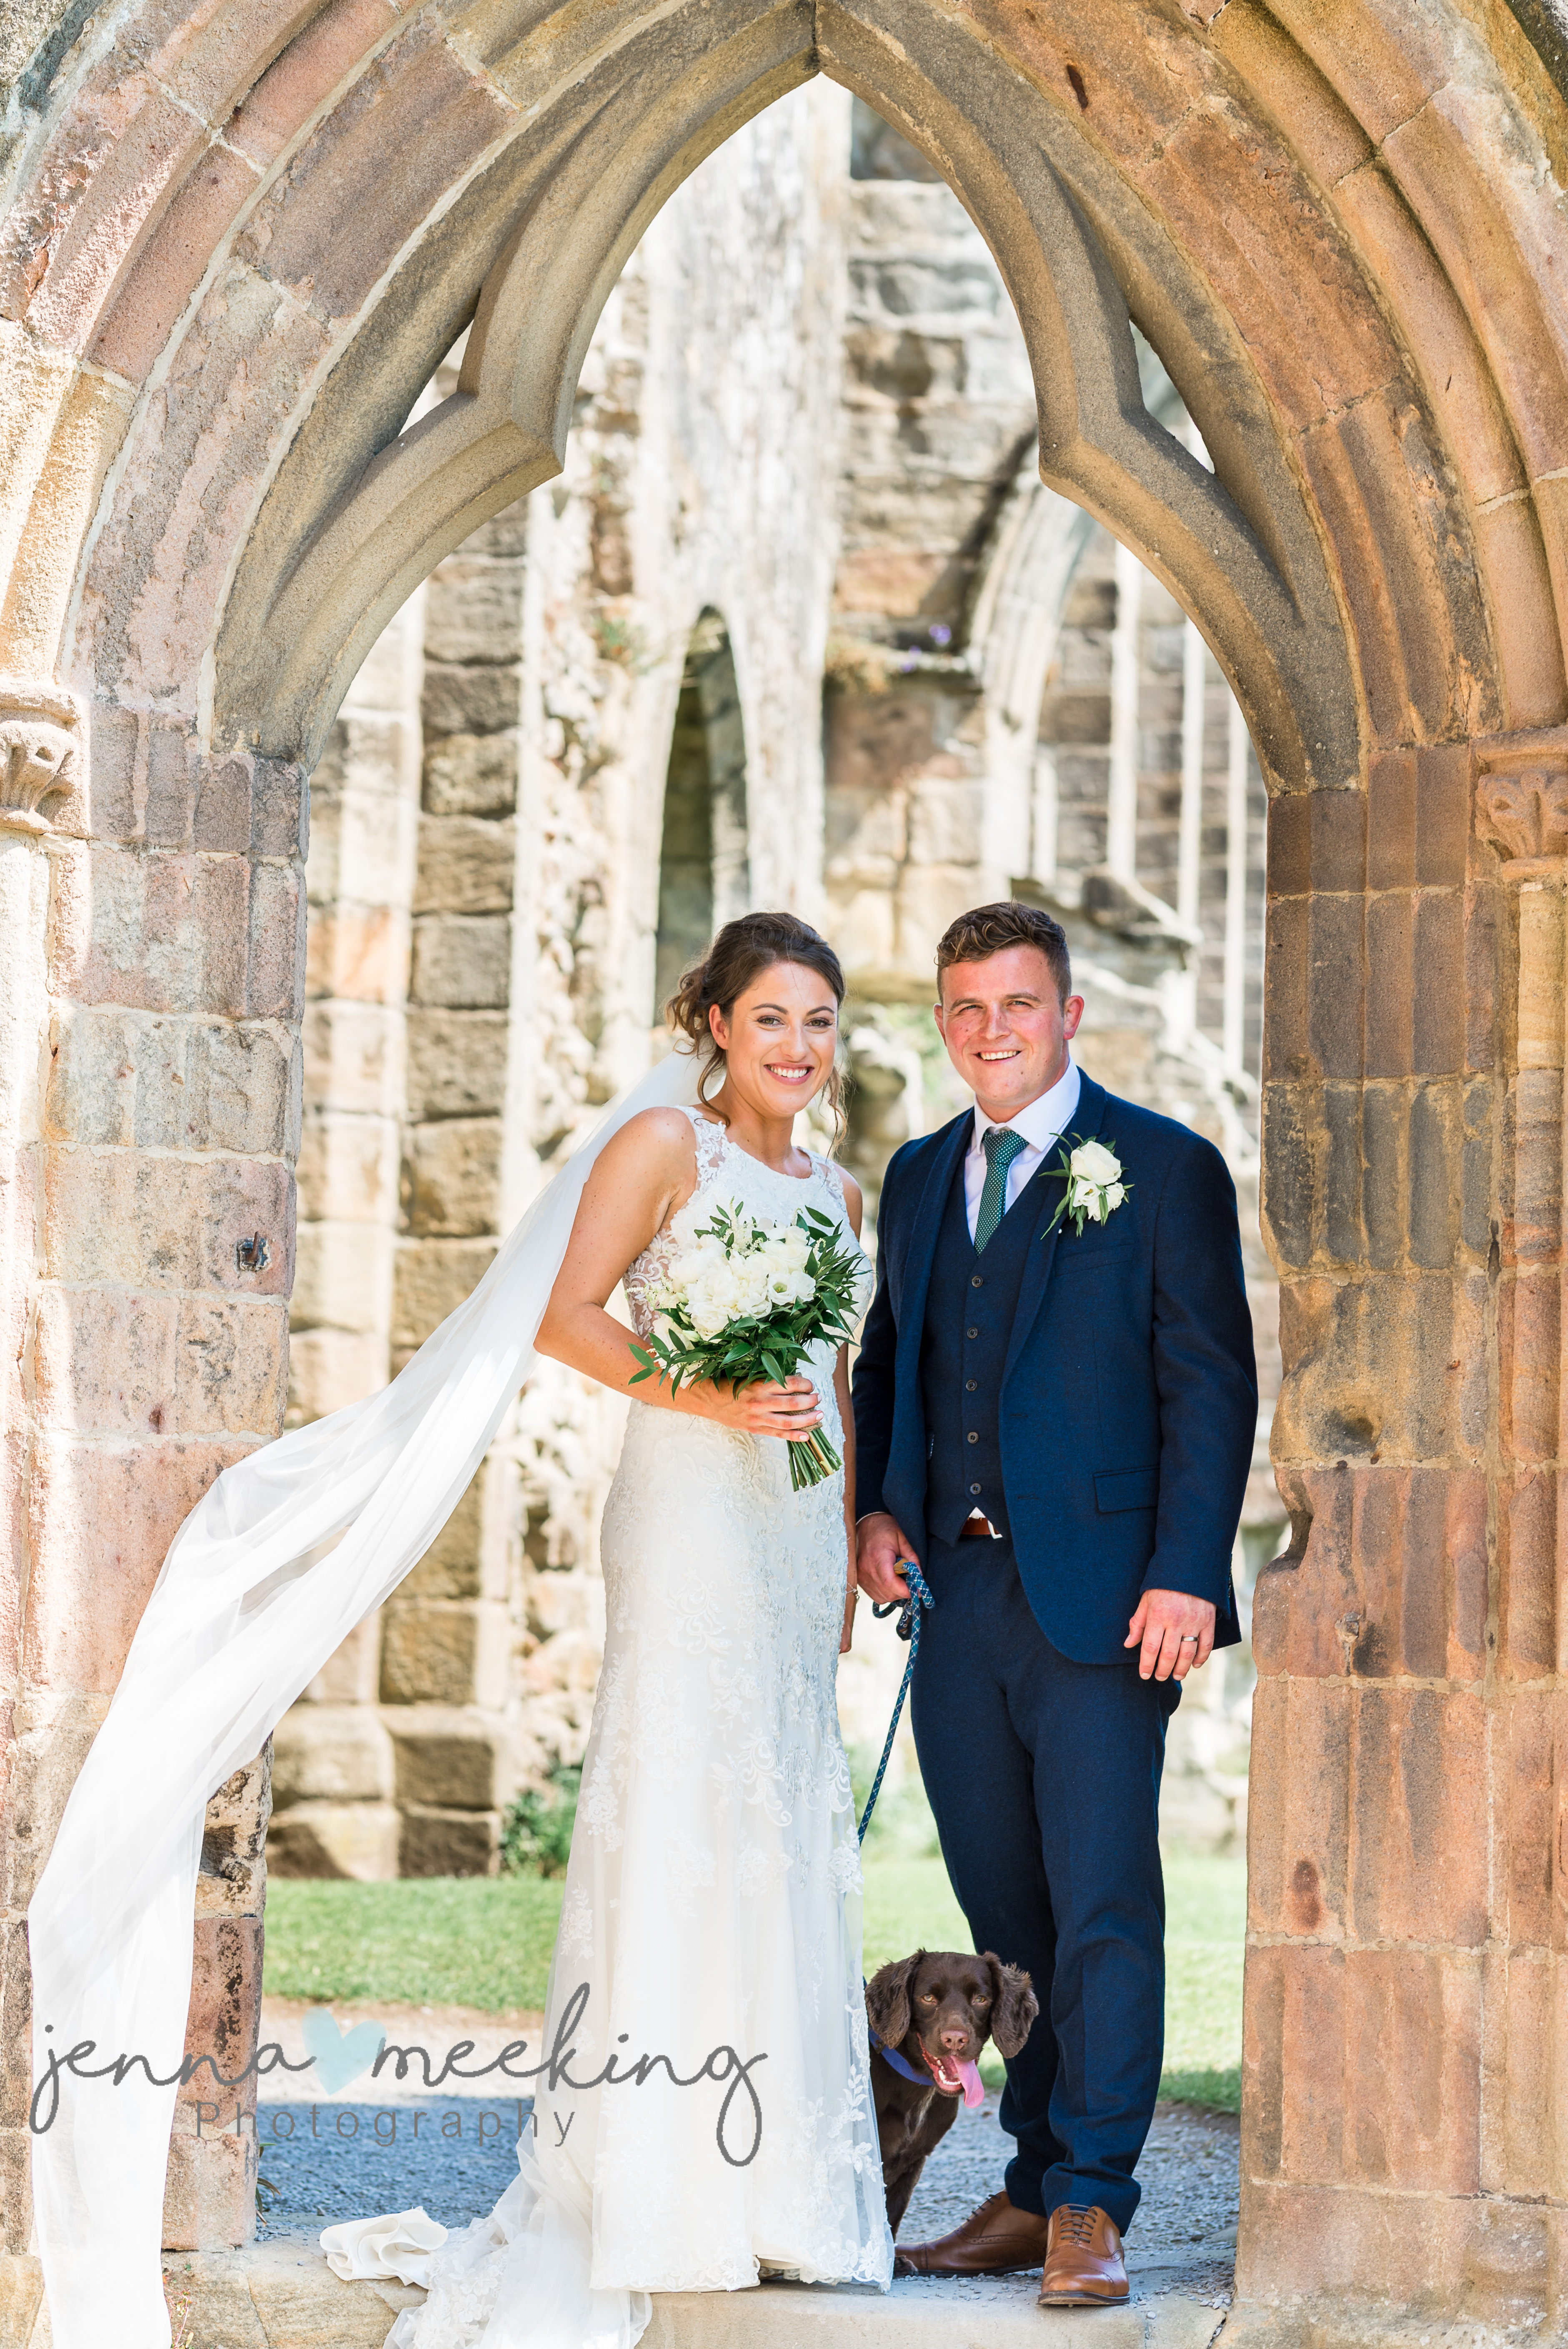 Priory Bolton Abbey Wedding Photo